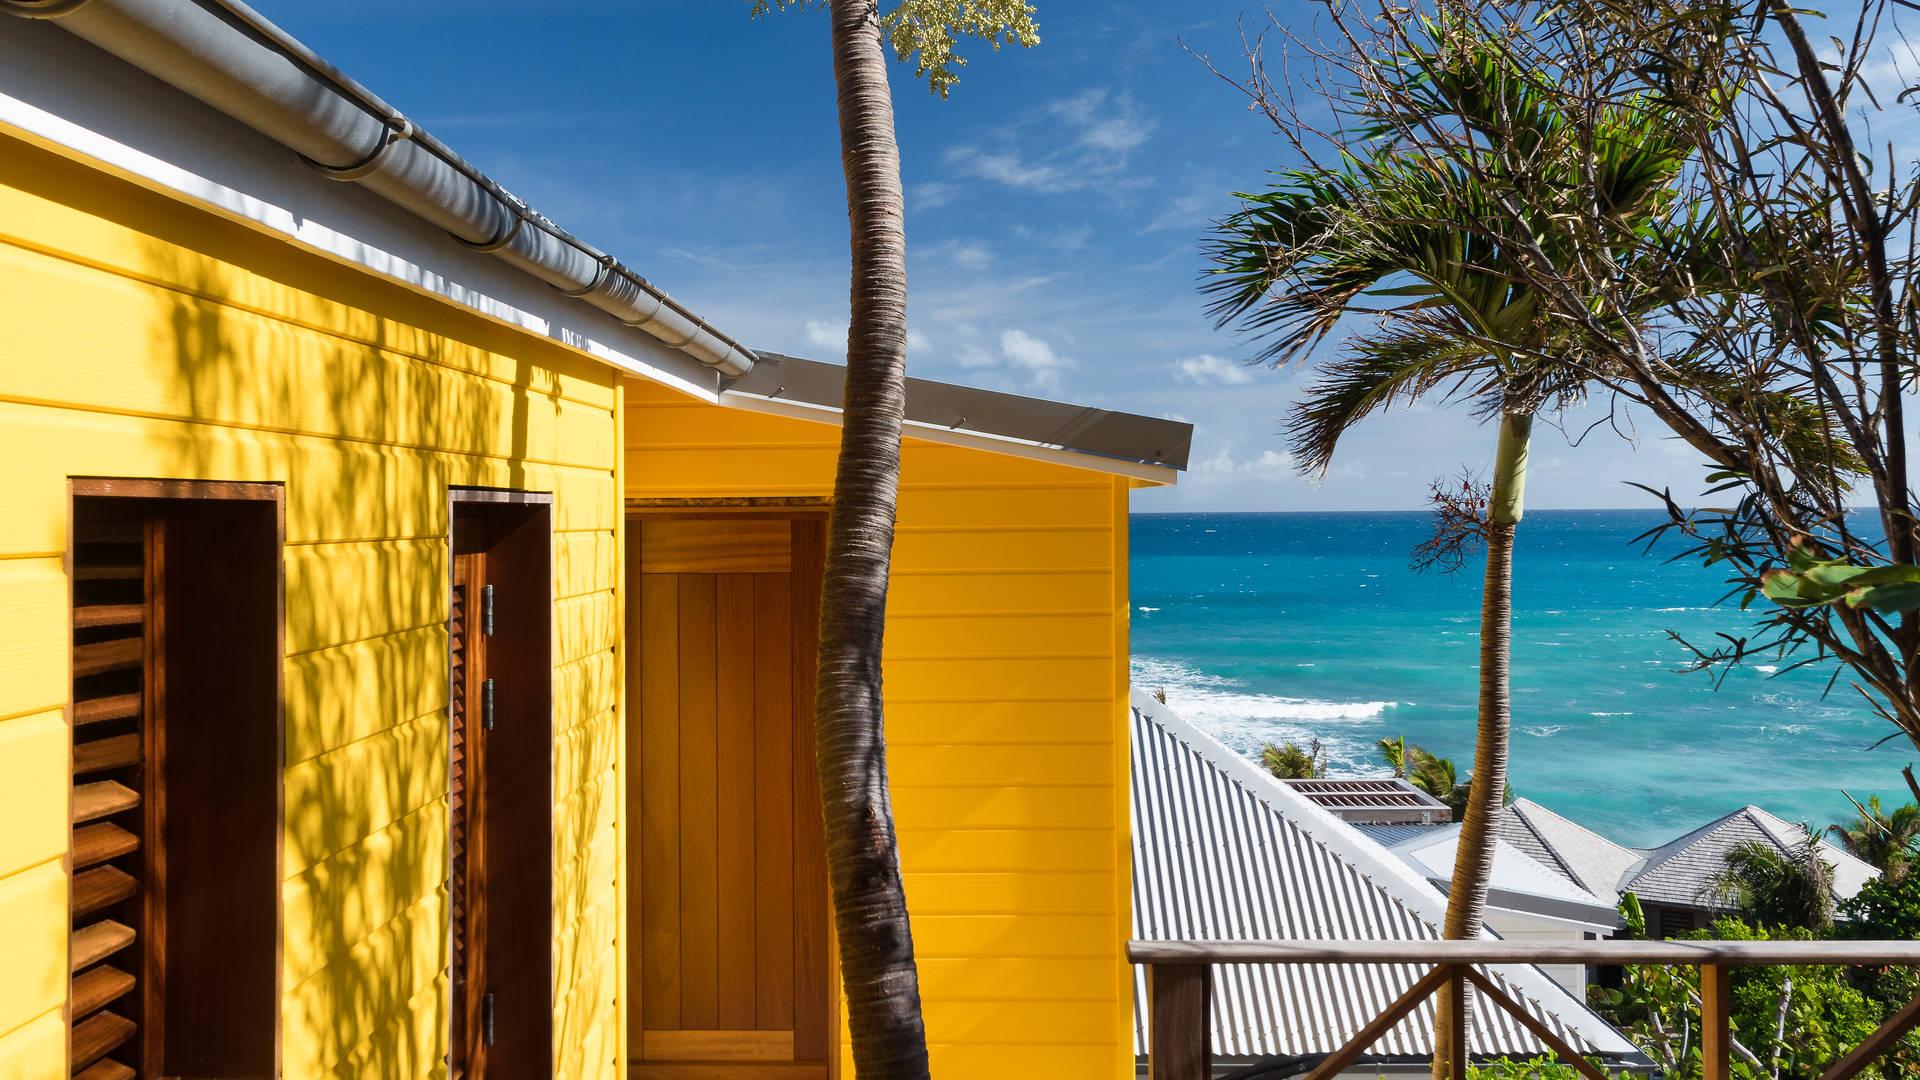 manapany-Extérieur - Ocean Prestige - Hotel Manapany.jpg